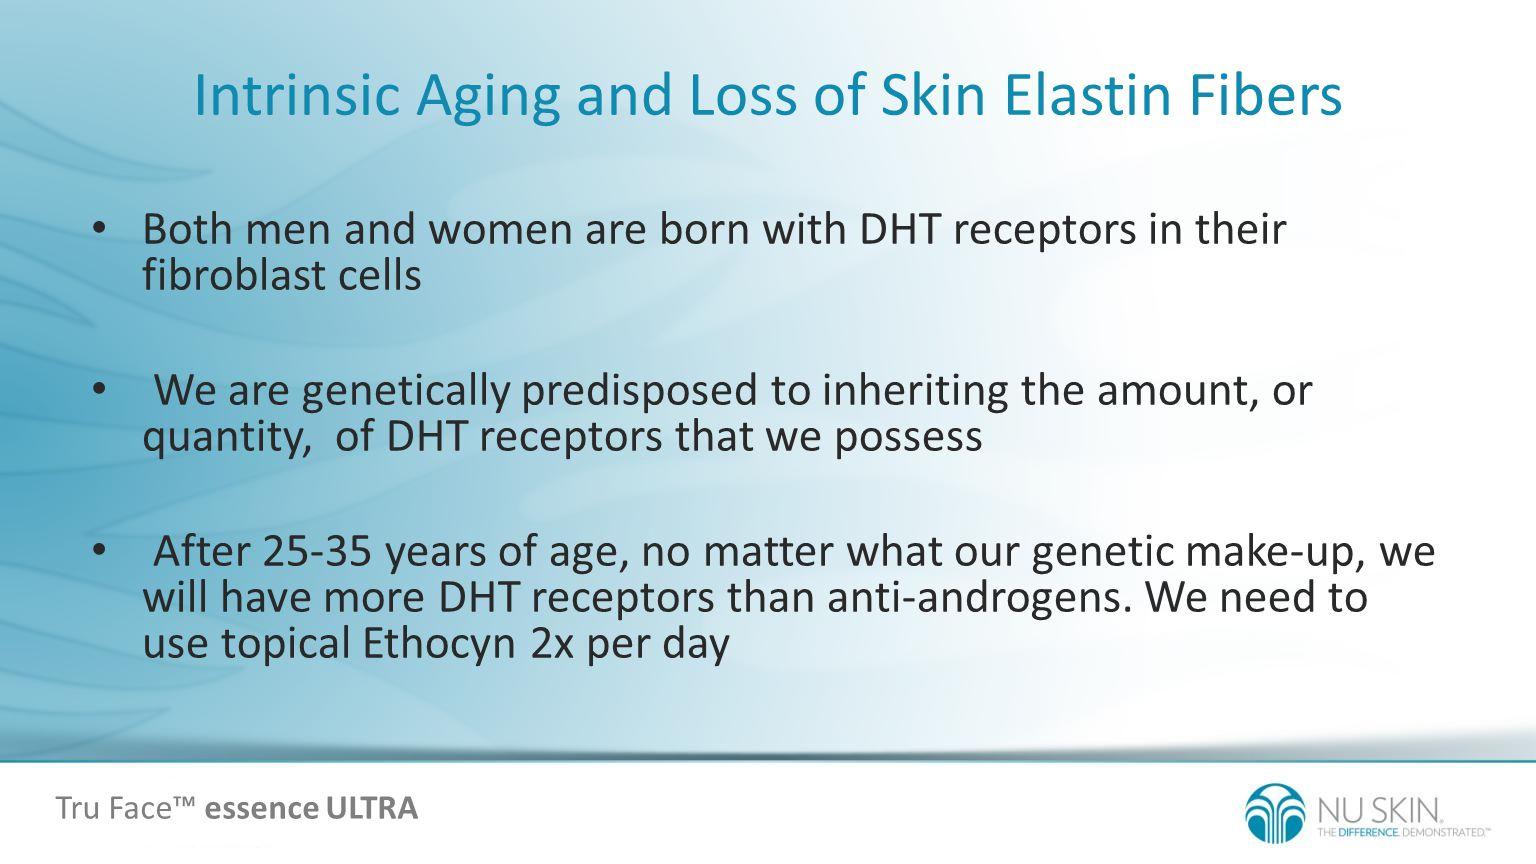 Intrinsic Aging and Loss of Skin Elastin Fibers